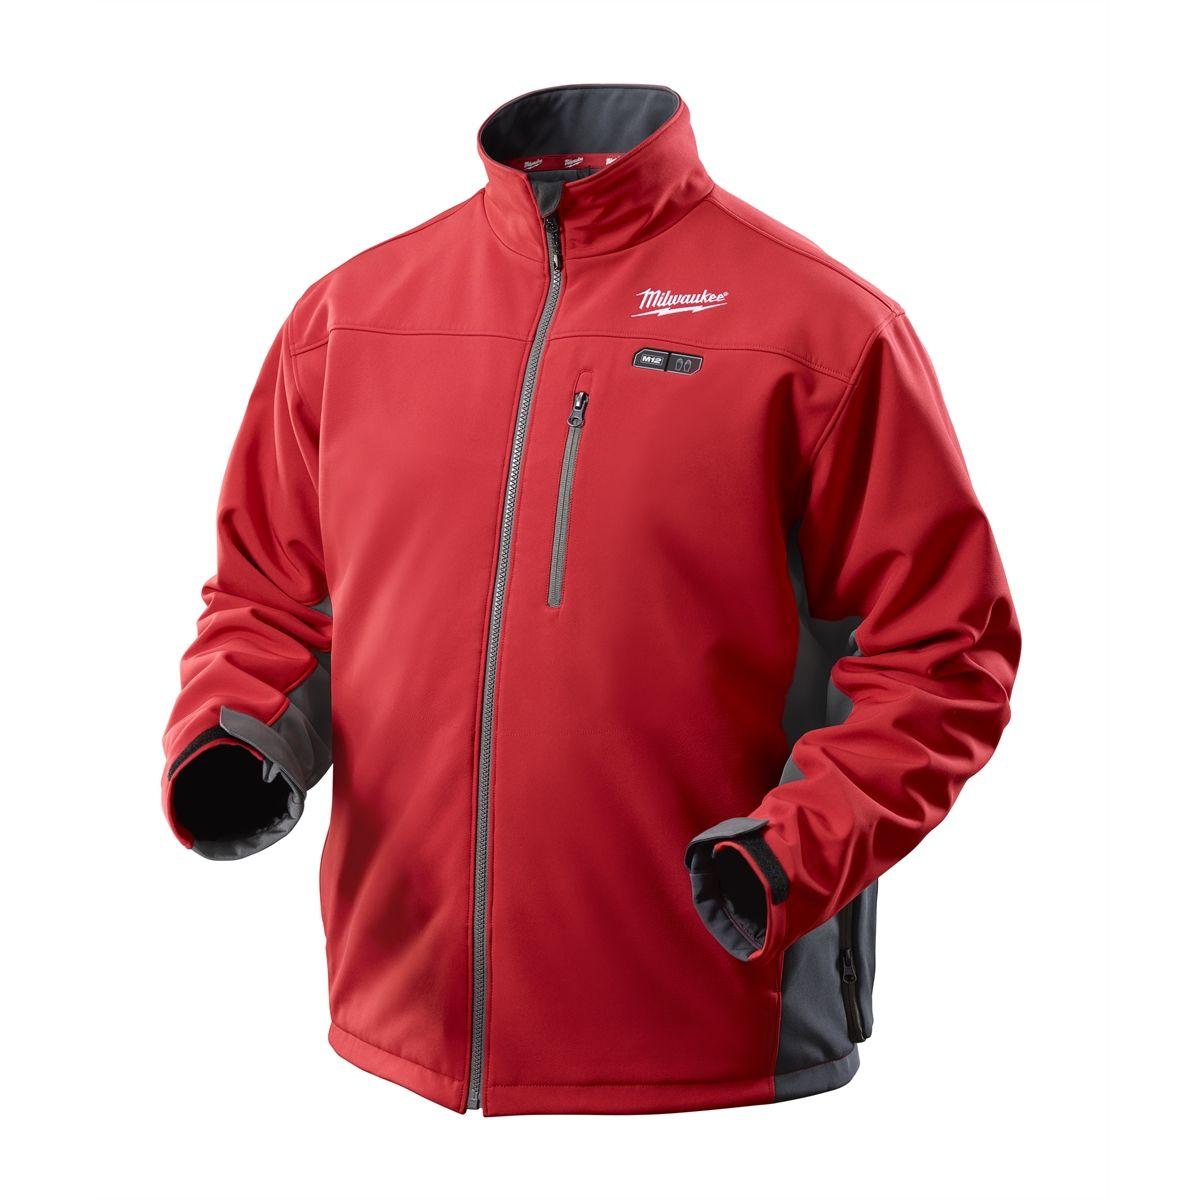 M12 Cordless Red Heated Jacket Kit - XL